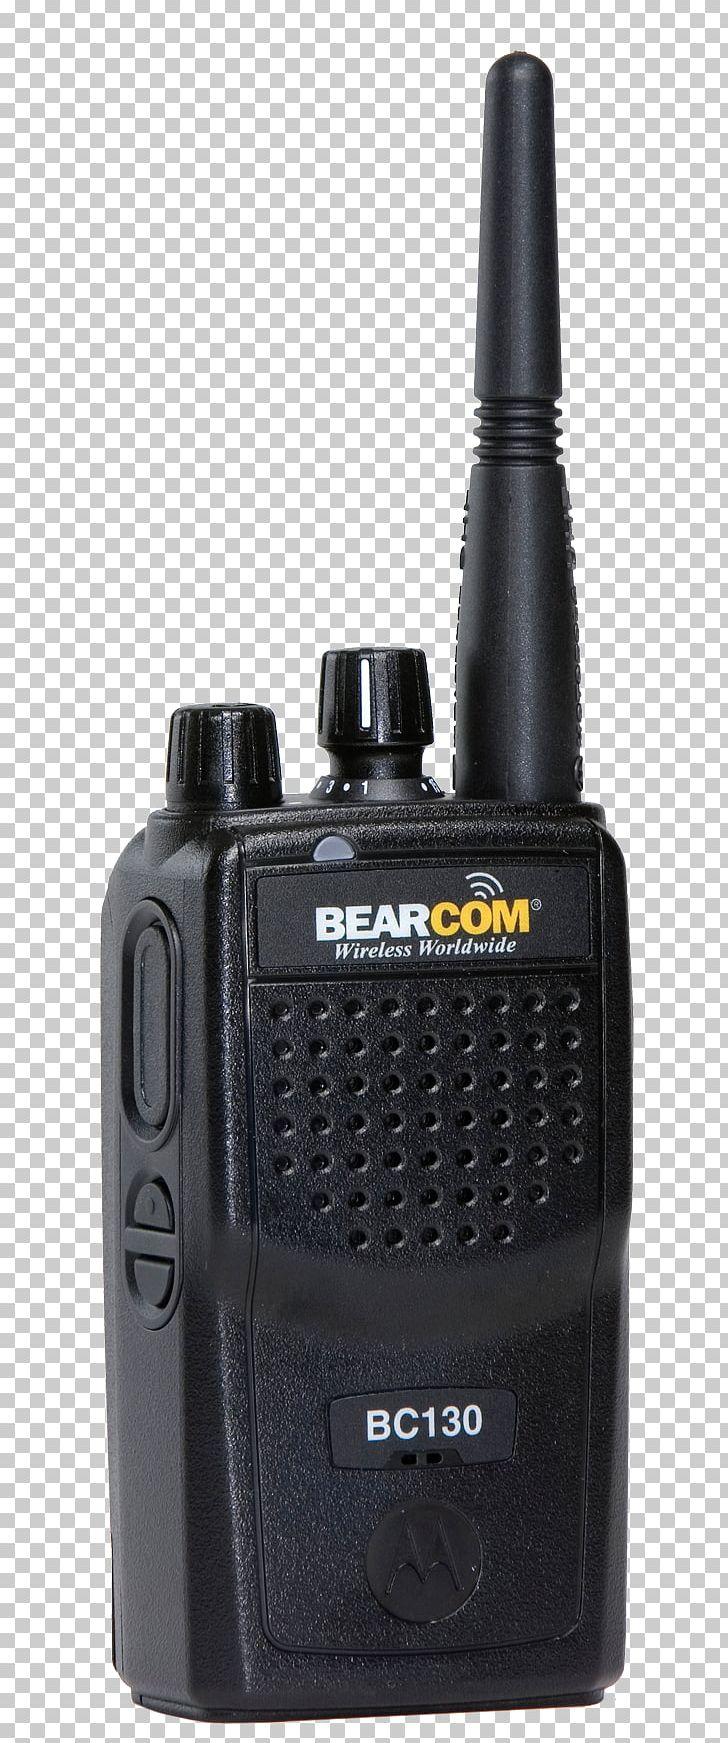 Walkie-talkie Two-way Radio Motorola Mobile Phones PNG, Clipart, Aerials, Communication, Communication Device, Electronic Device, Electronics Free PNG Download